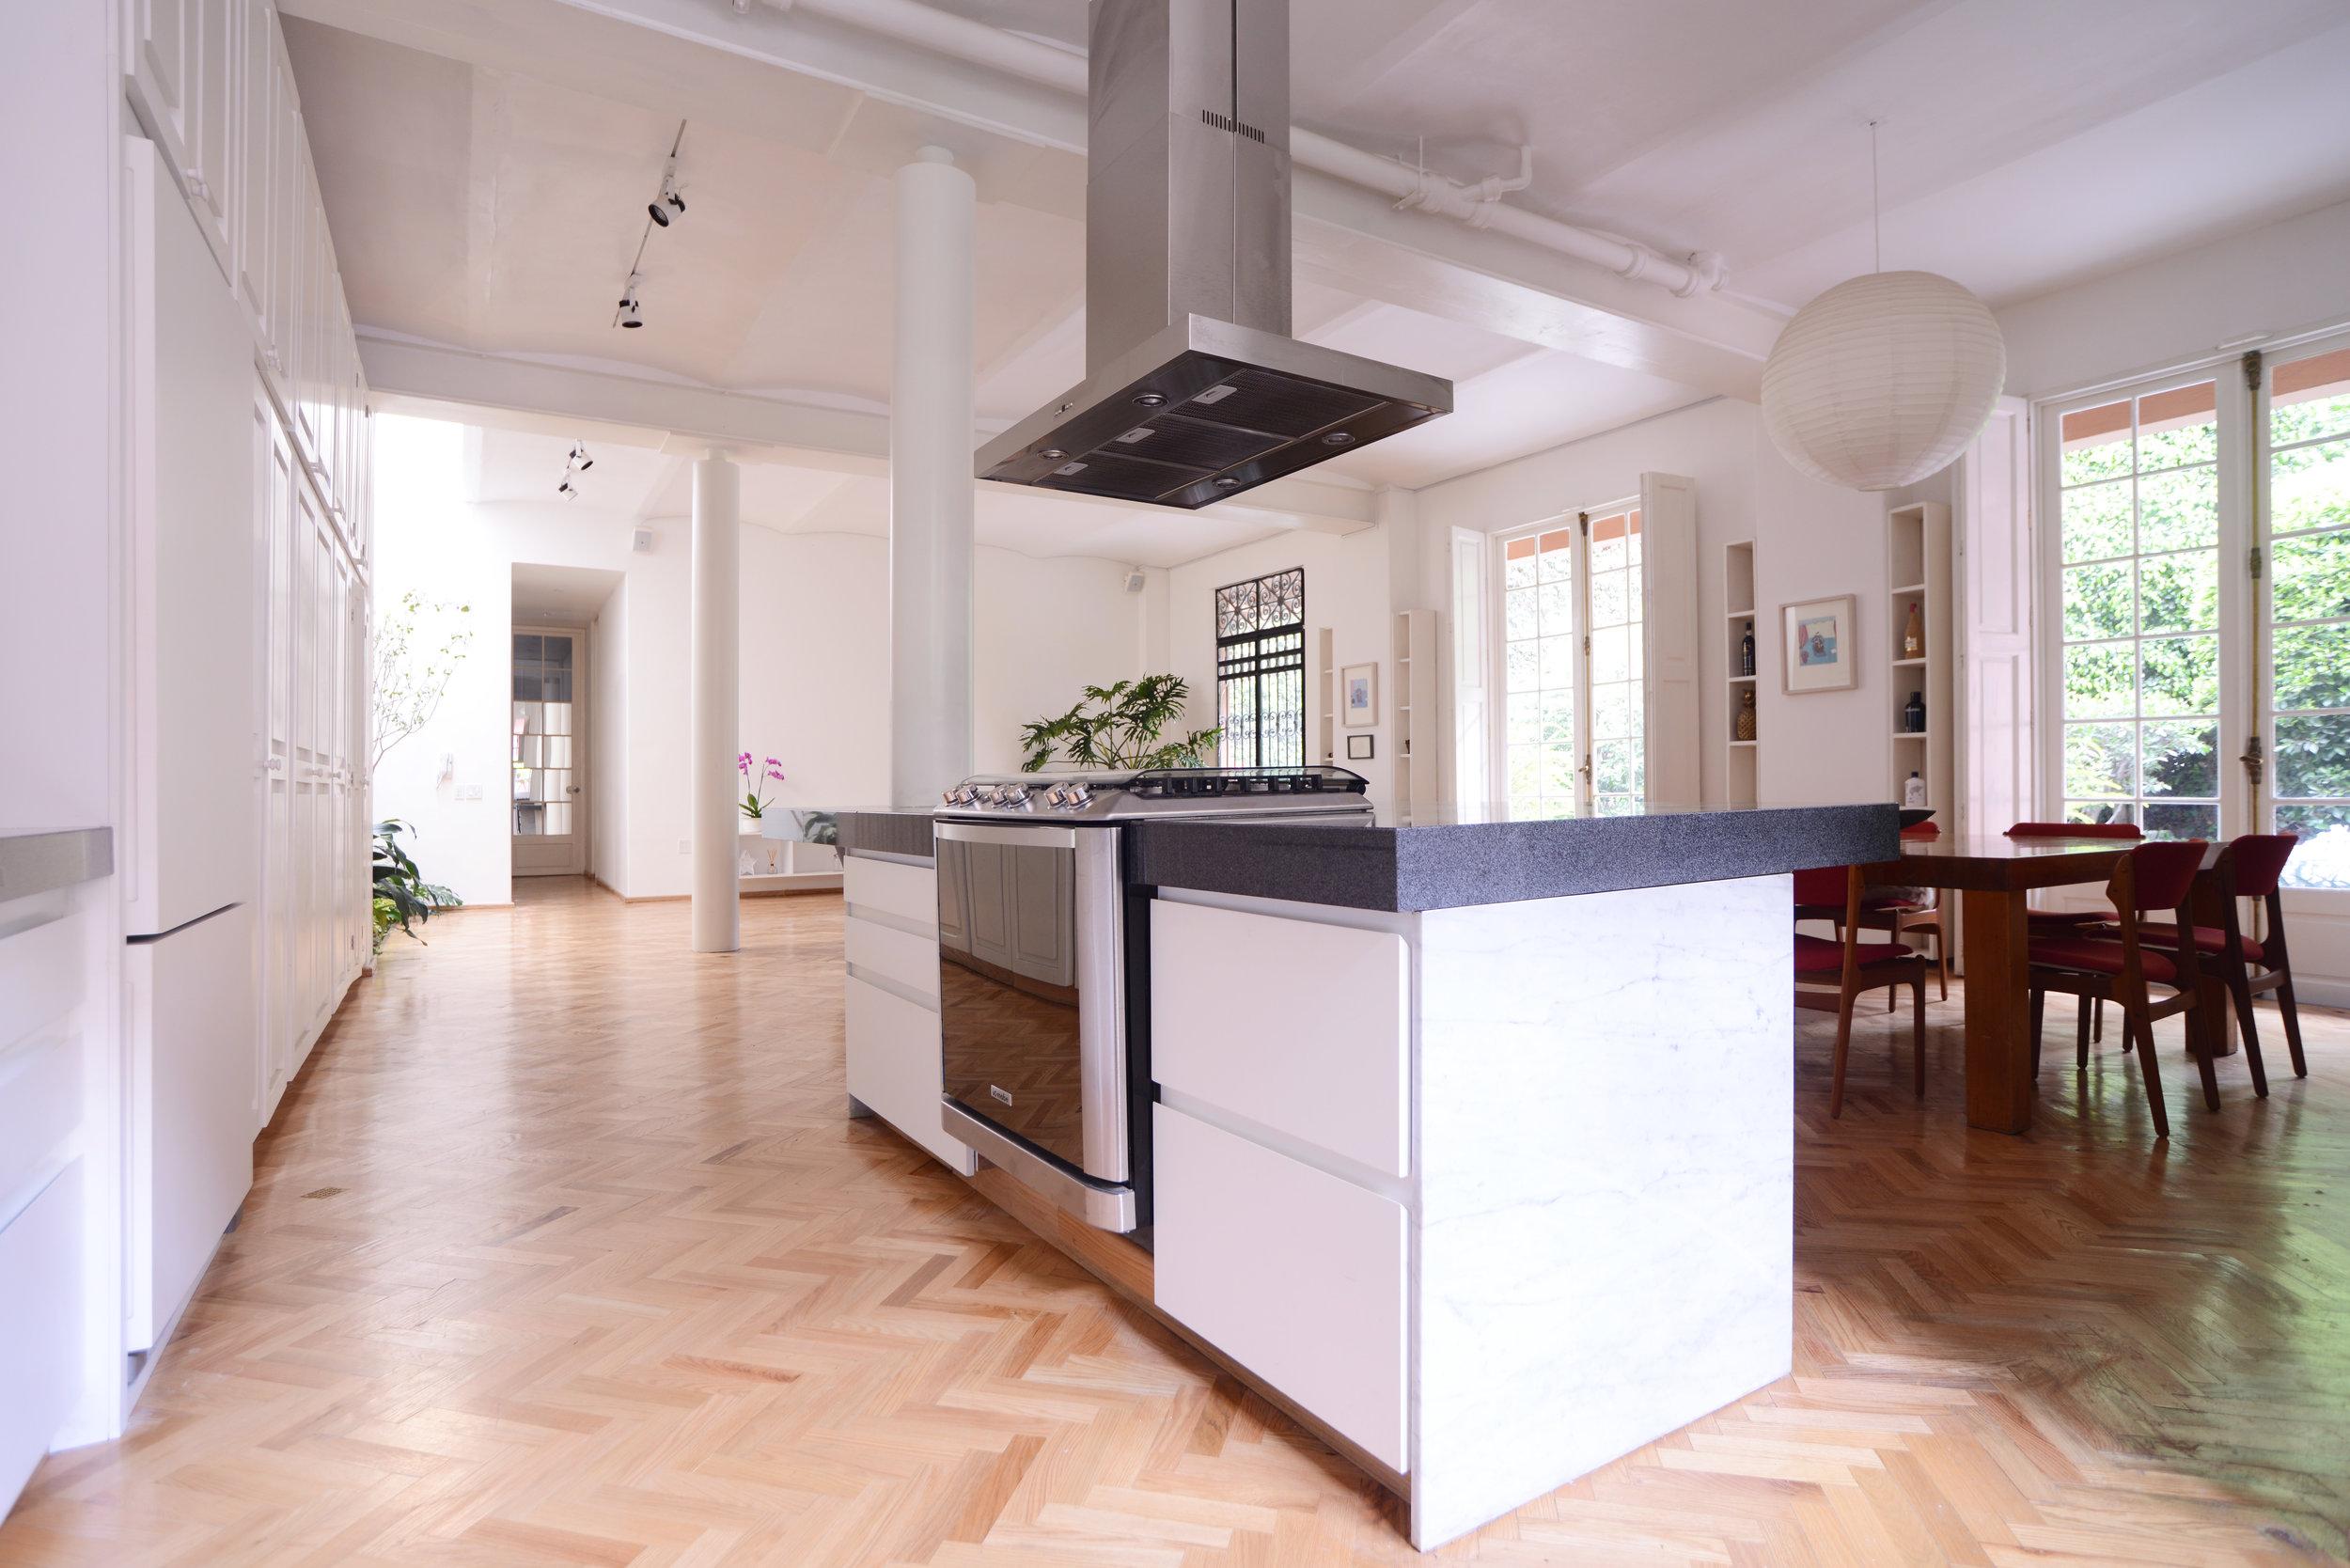 Casa Vieyra_6_BBL ARQUITECTOS.jpg